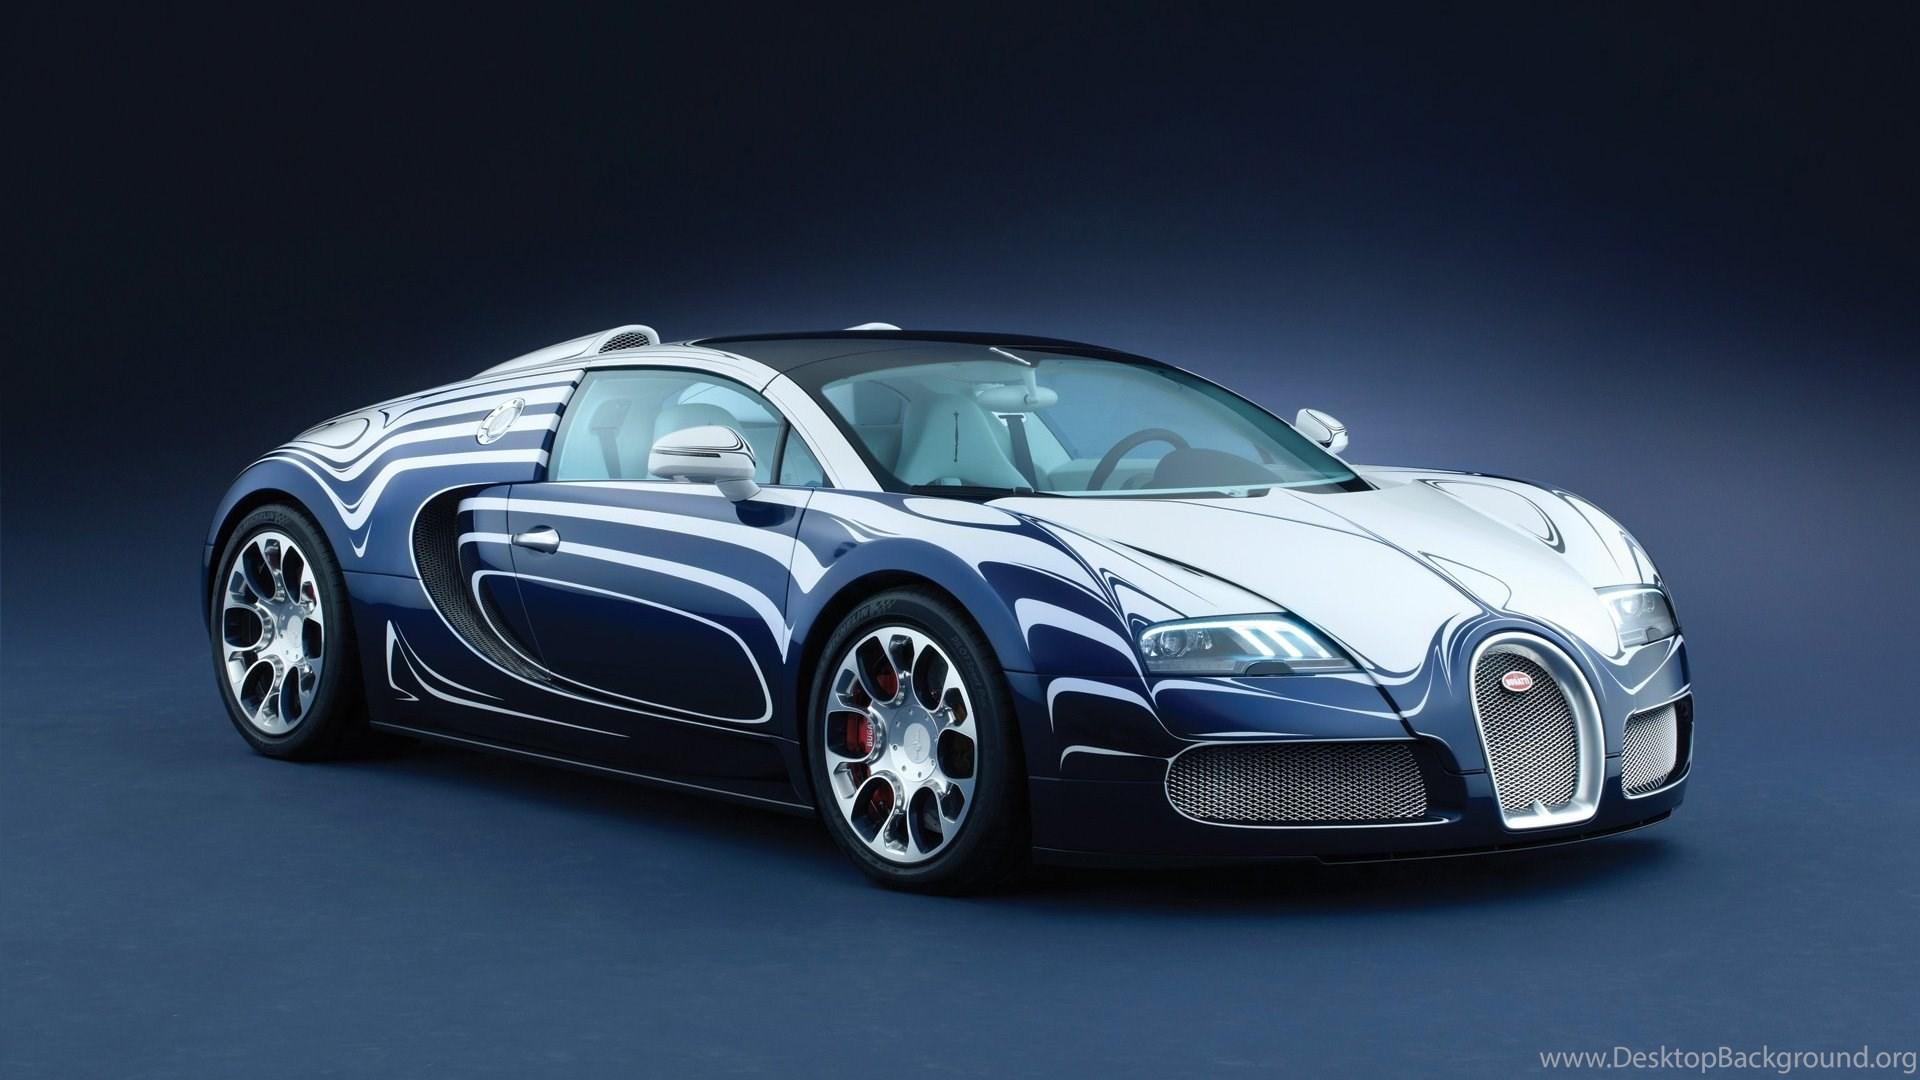 Luxury Car Bugatti Veyron Hd Wallpapers Car Hd Wallpapers Desktop